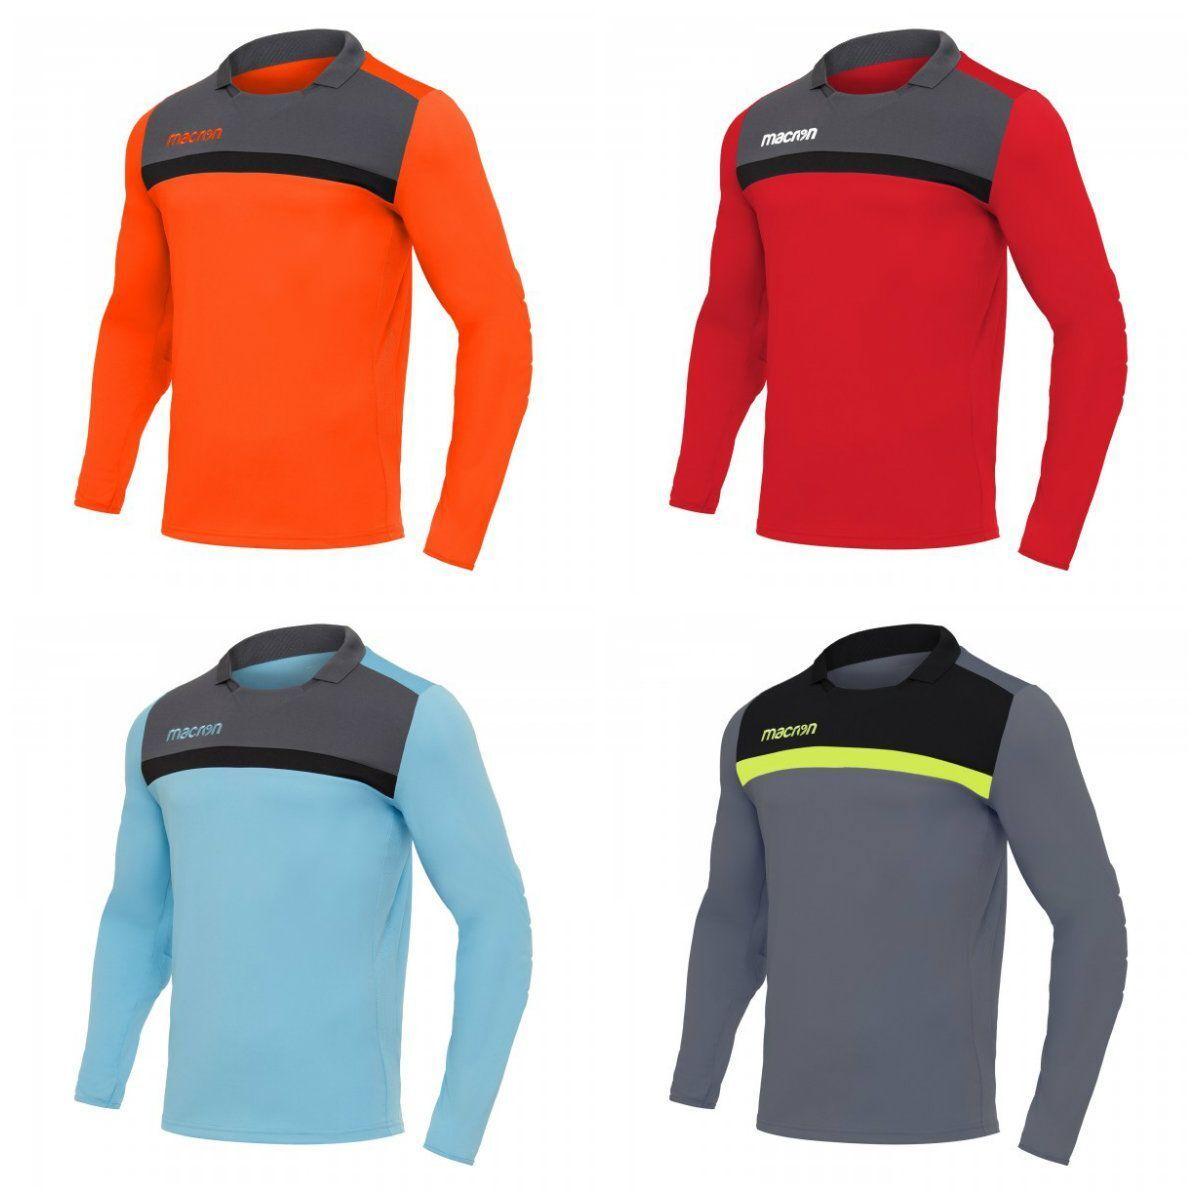 FOOTBALL GOALKEEPER SHIRT FEO - MACRON - Long Sleeves - Sizes from 3XS to 3XL